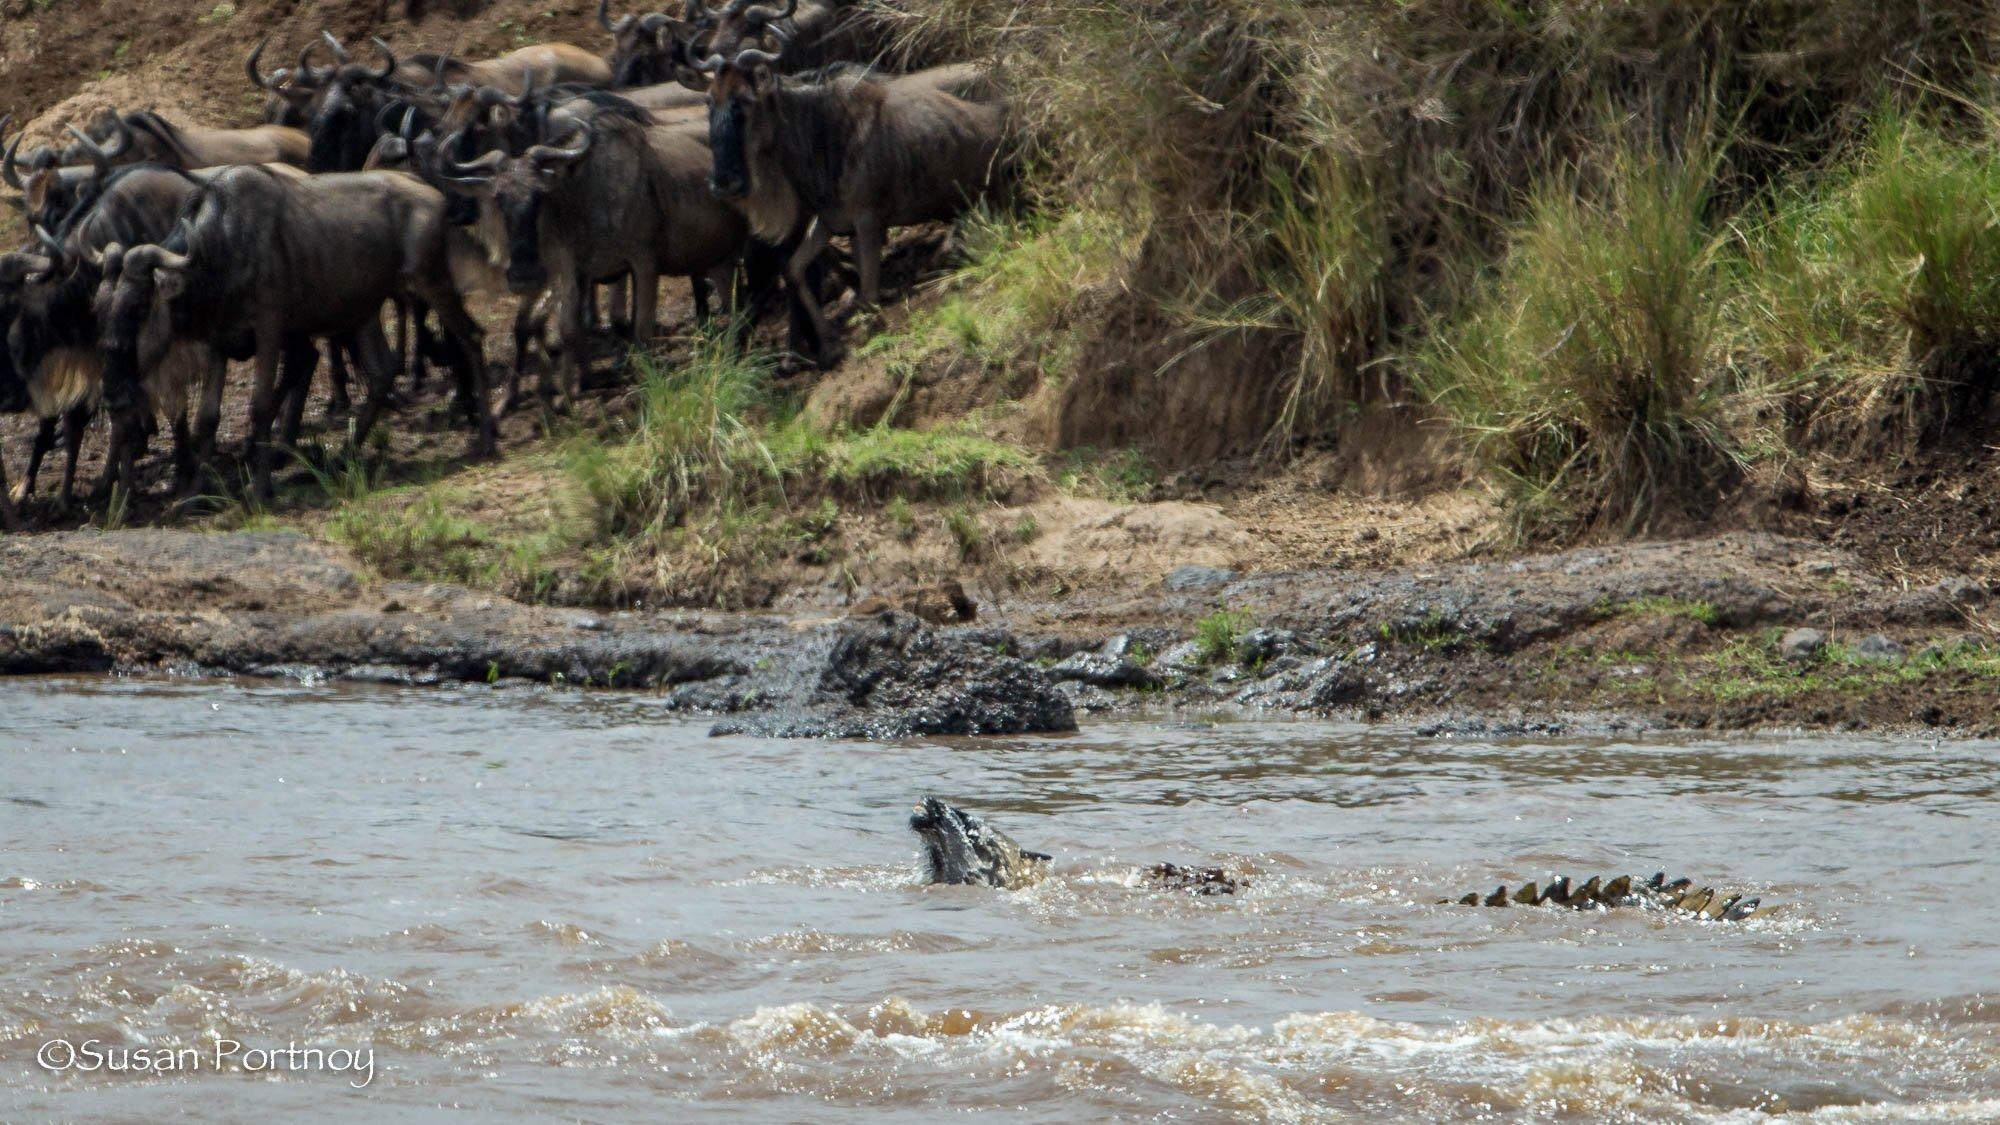 A crocodile drowns a wildebeest in the Mara River